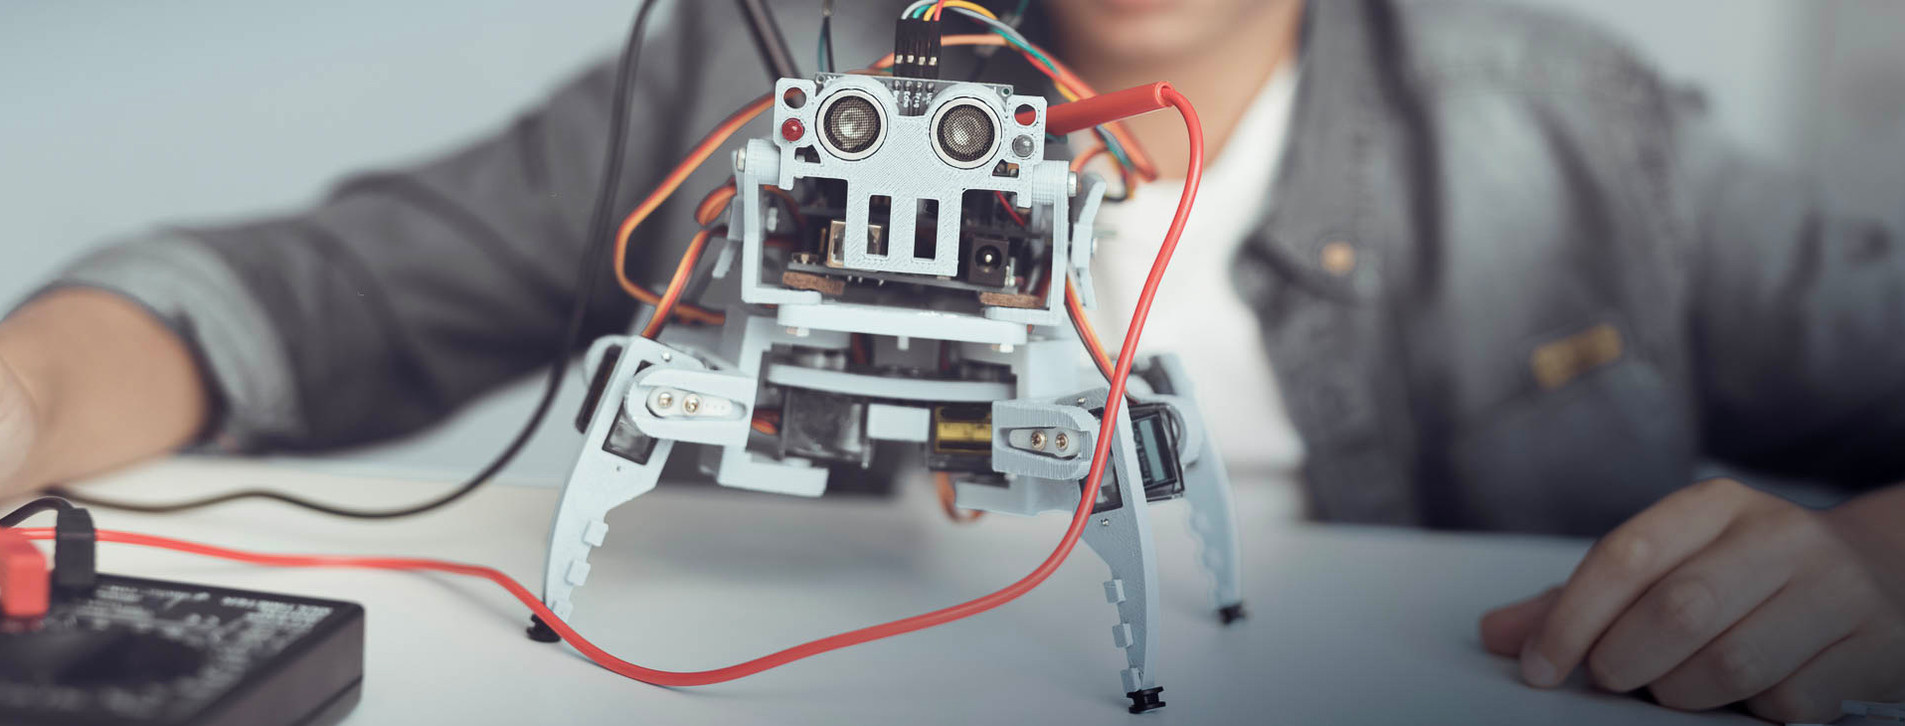 Фото 1 - Курс робототехники